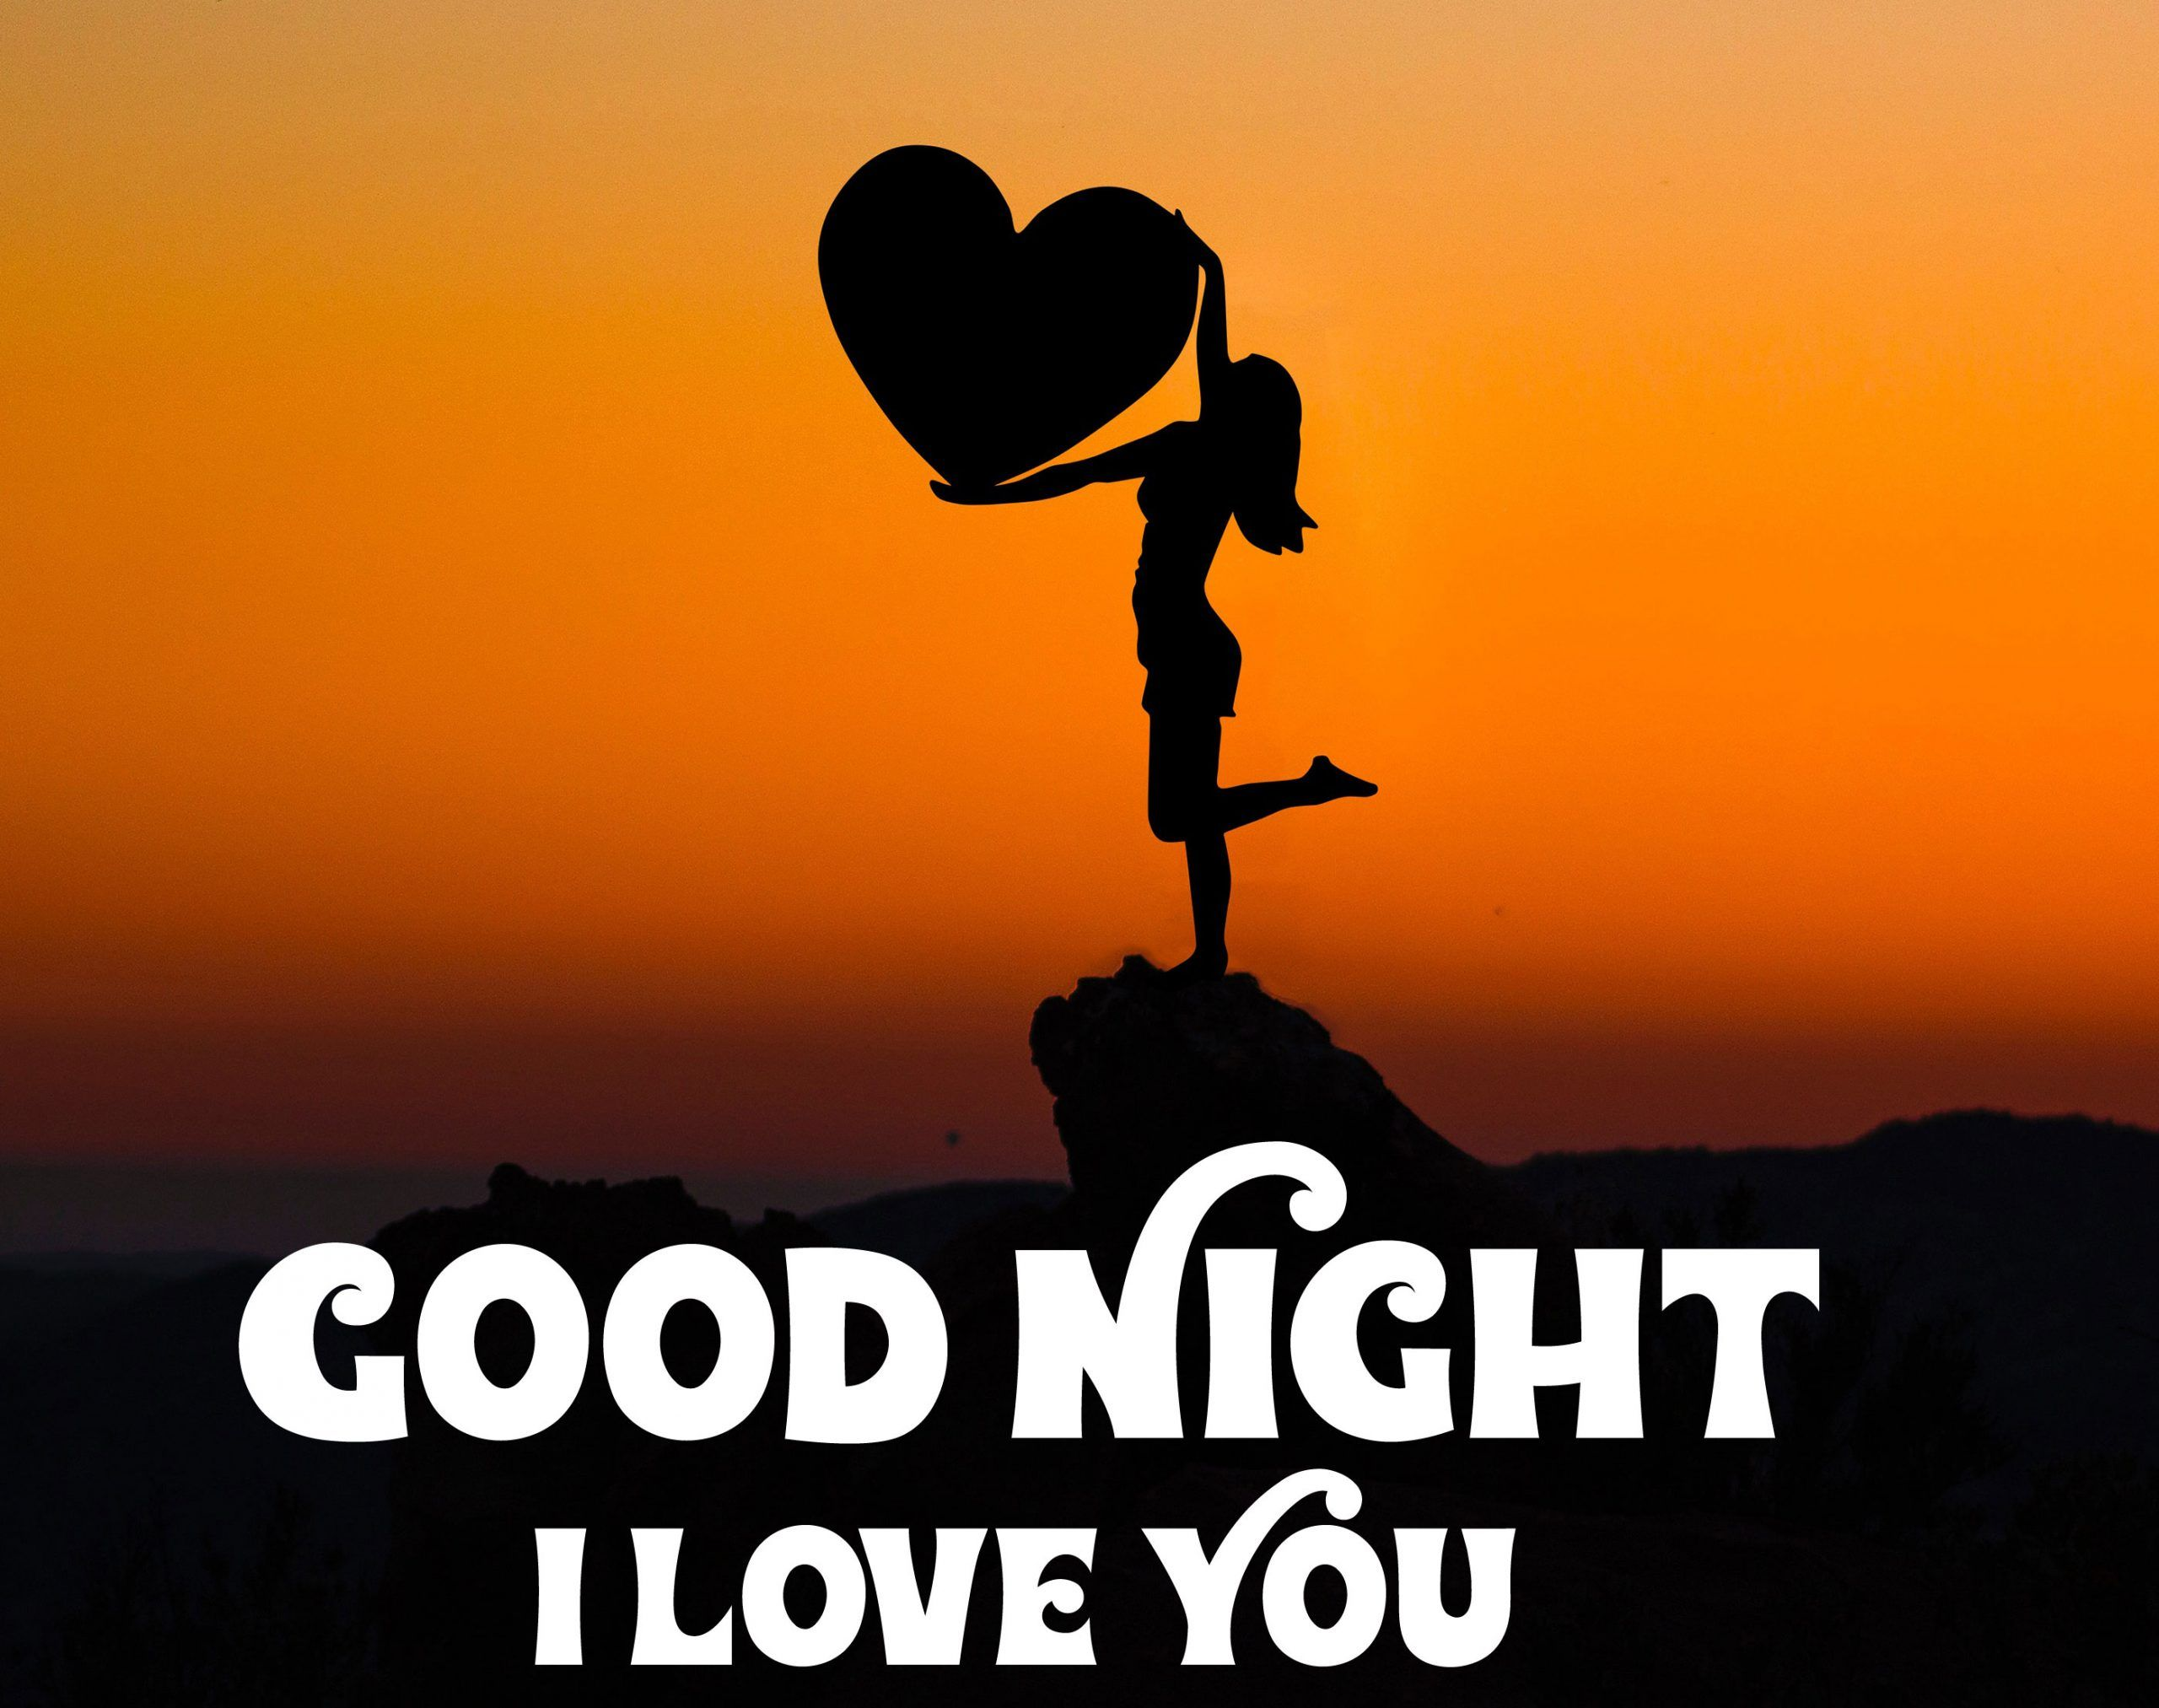 Love gud night